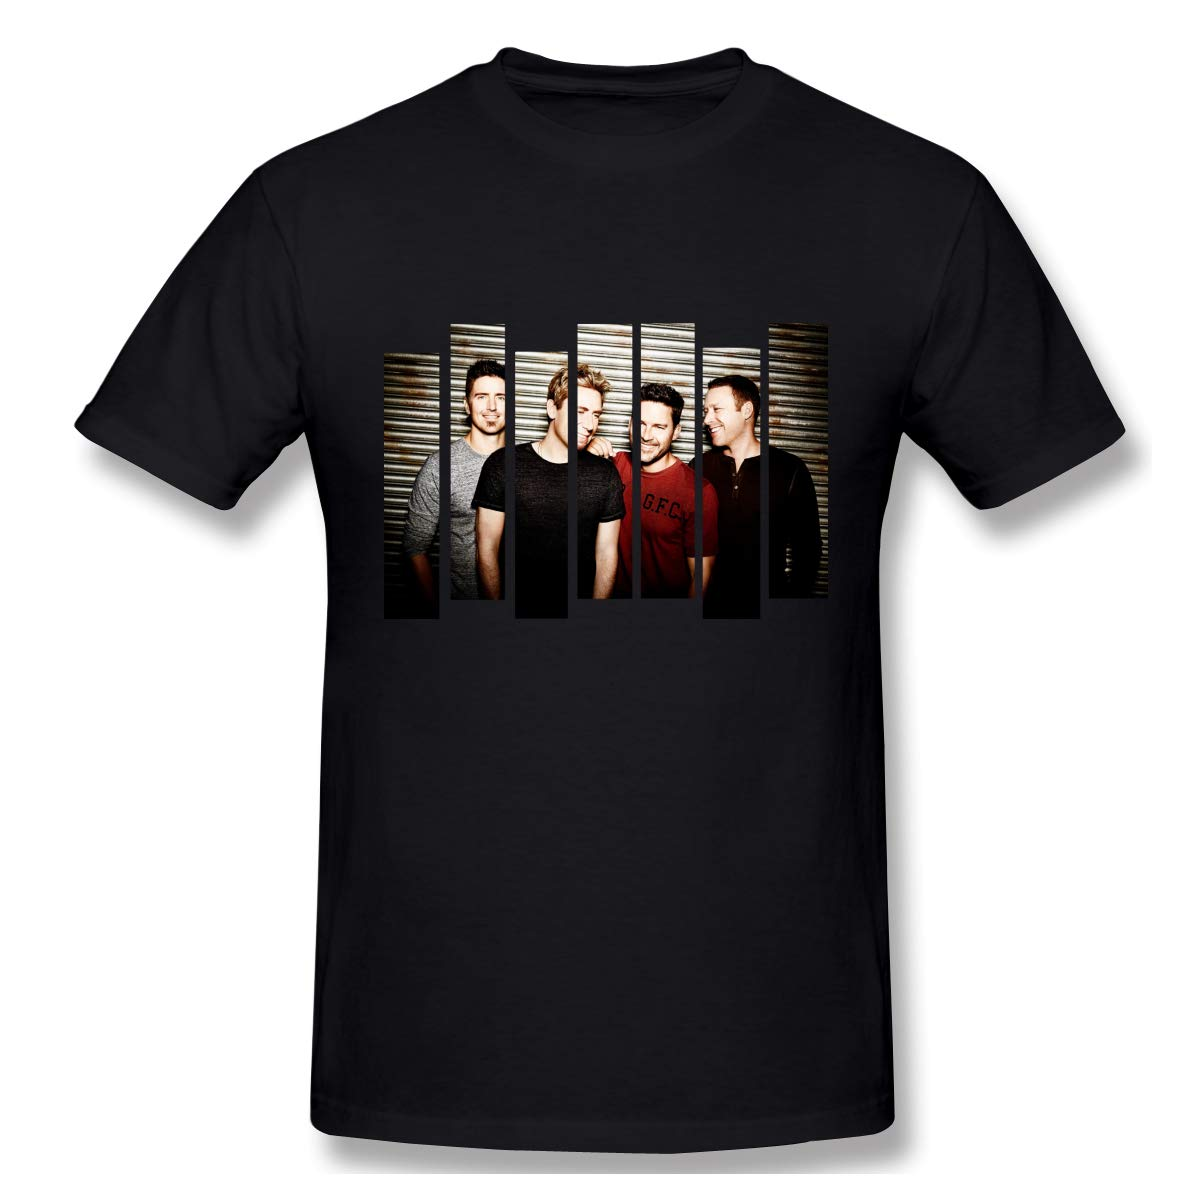 S Print With Nickelback Comfortable Outdoor Short Sleeve Shirt Black